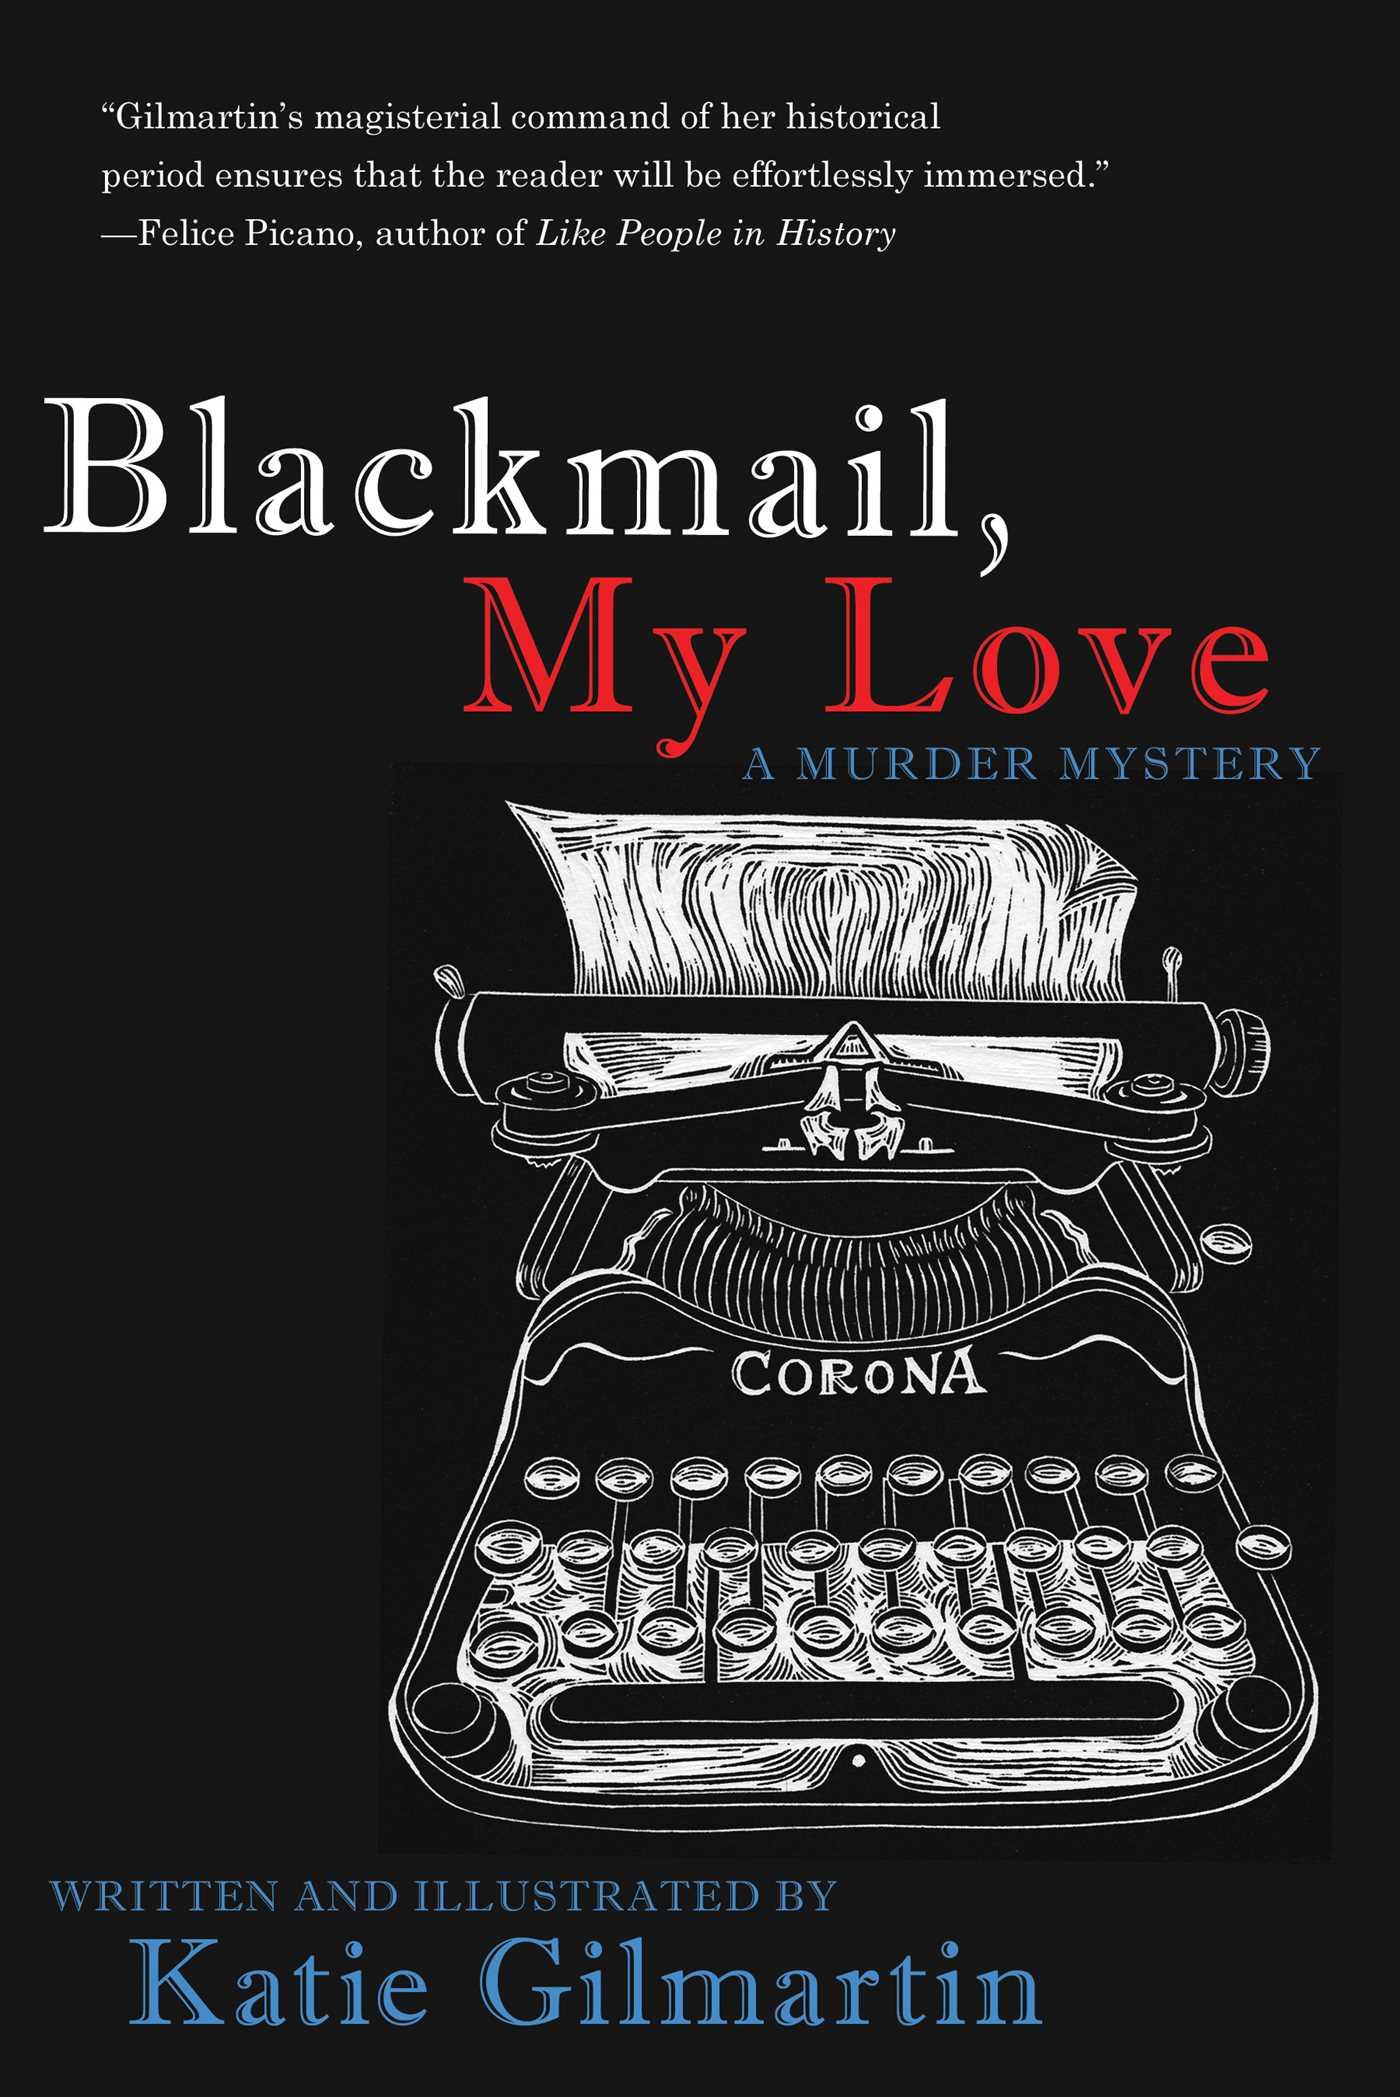 Blackmail my love 9781627780766 hr